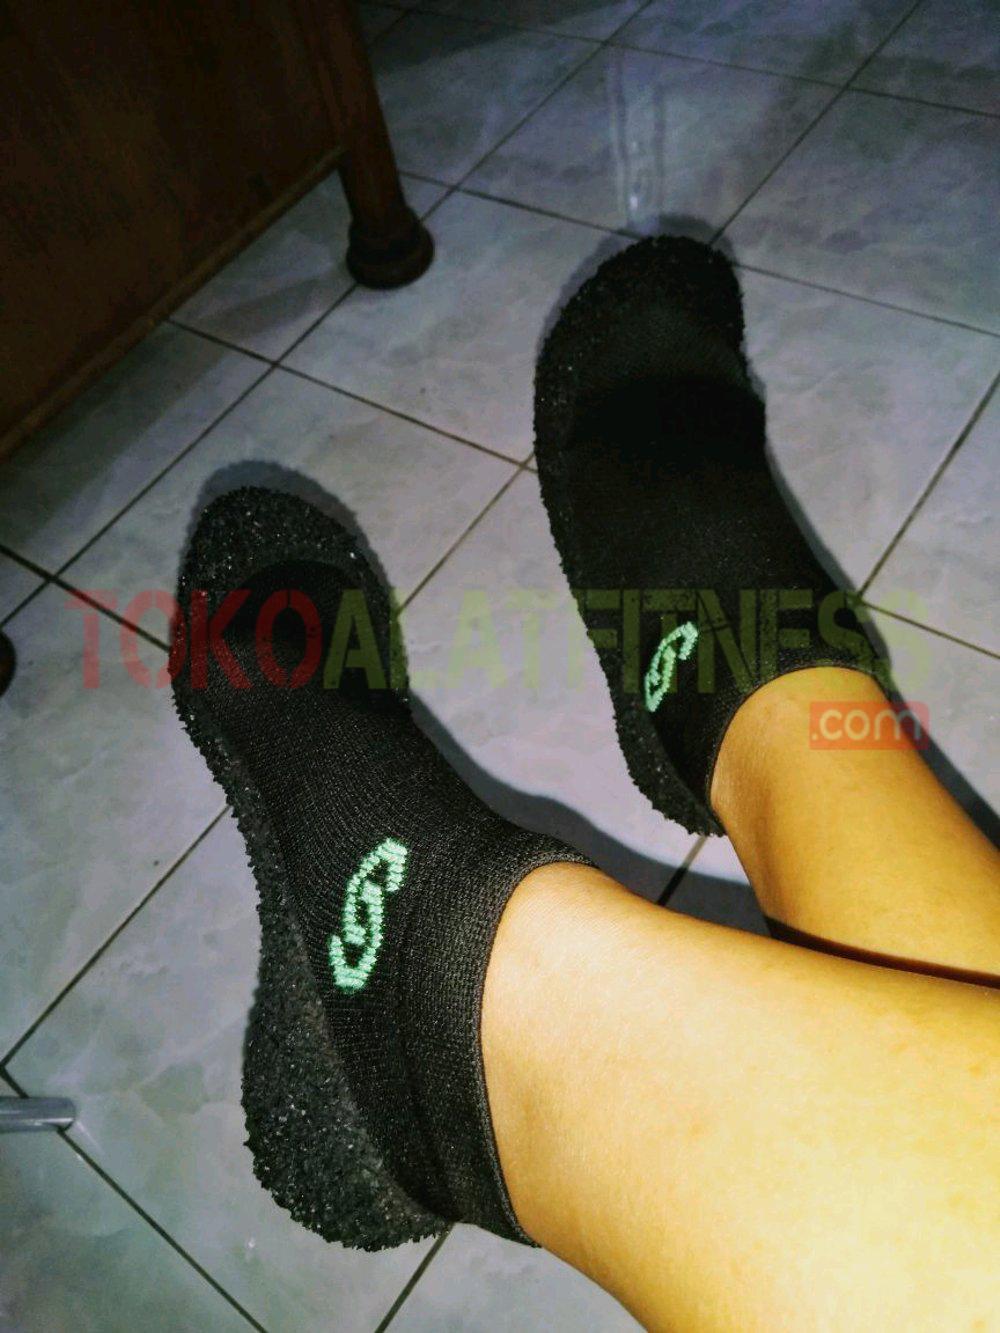 SKINNERS BLACK GREEN ORIGINAL WTM - SKINNERS Shocks Shoes Black Green